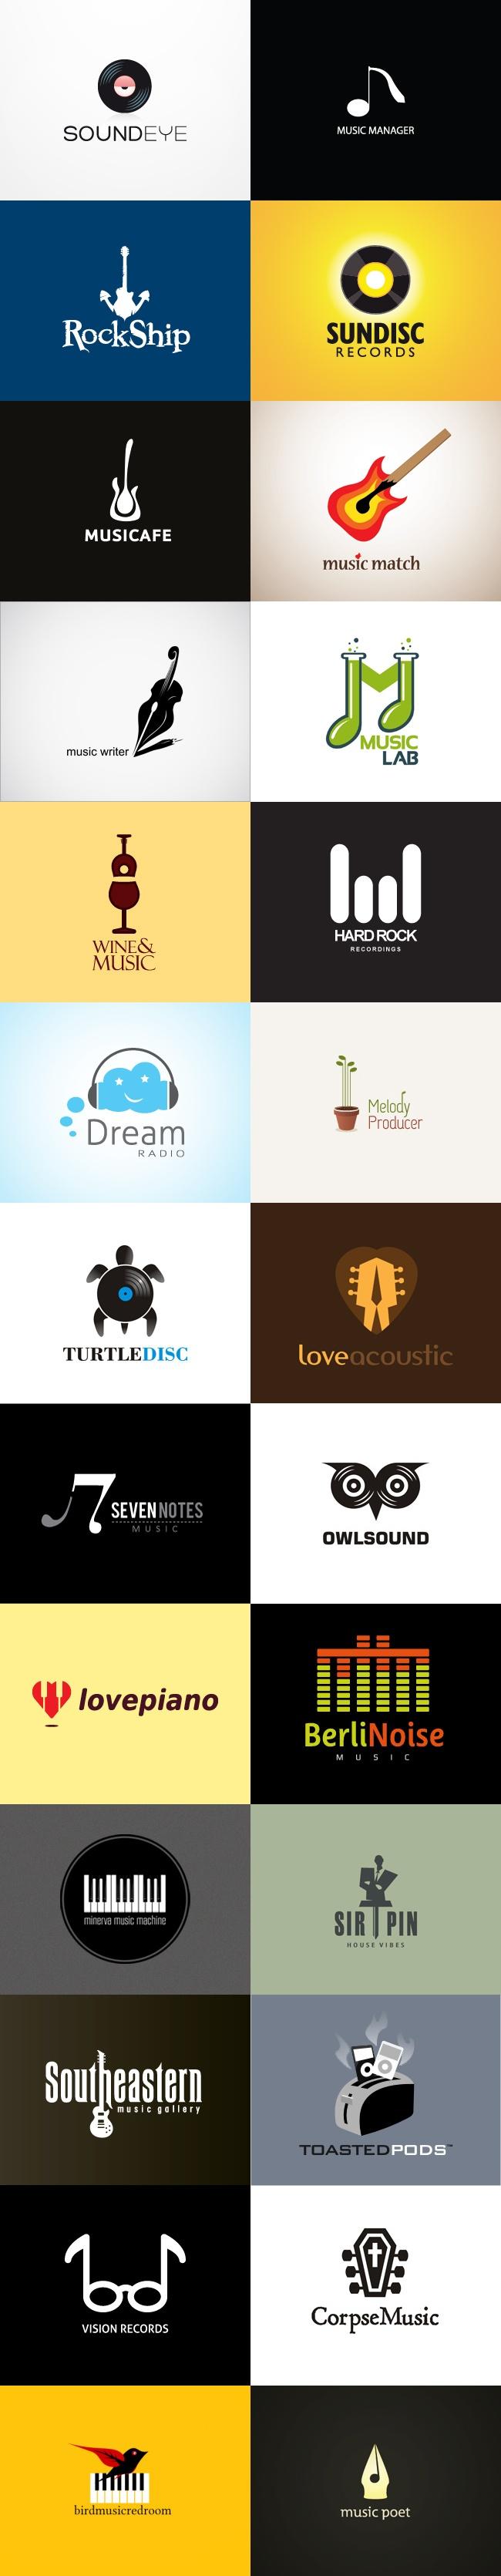 grafiker.de - Logo-Inspiration: Musik Teil 2